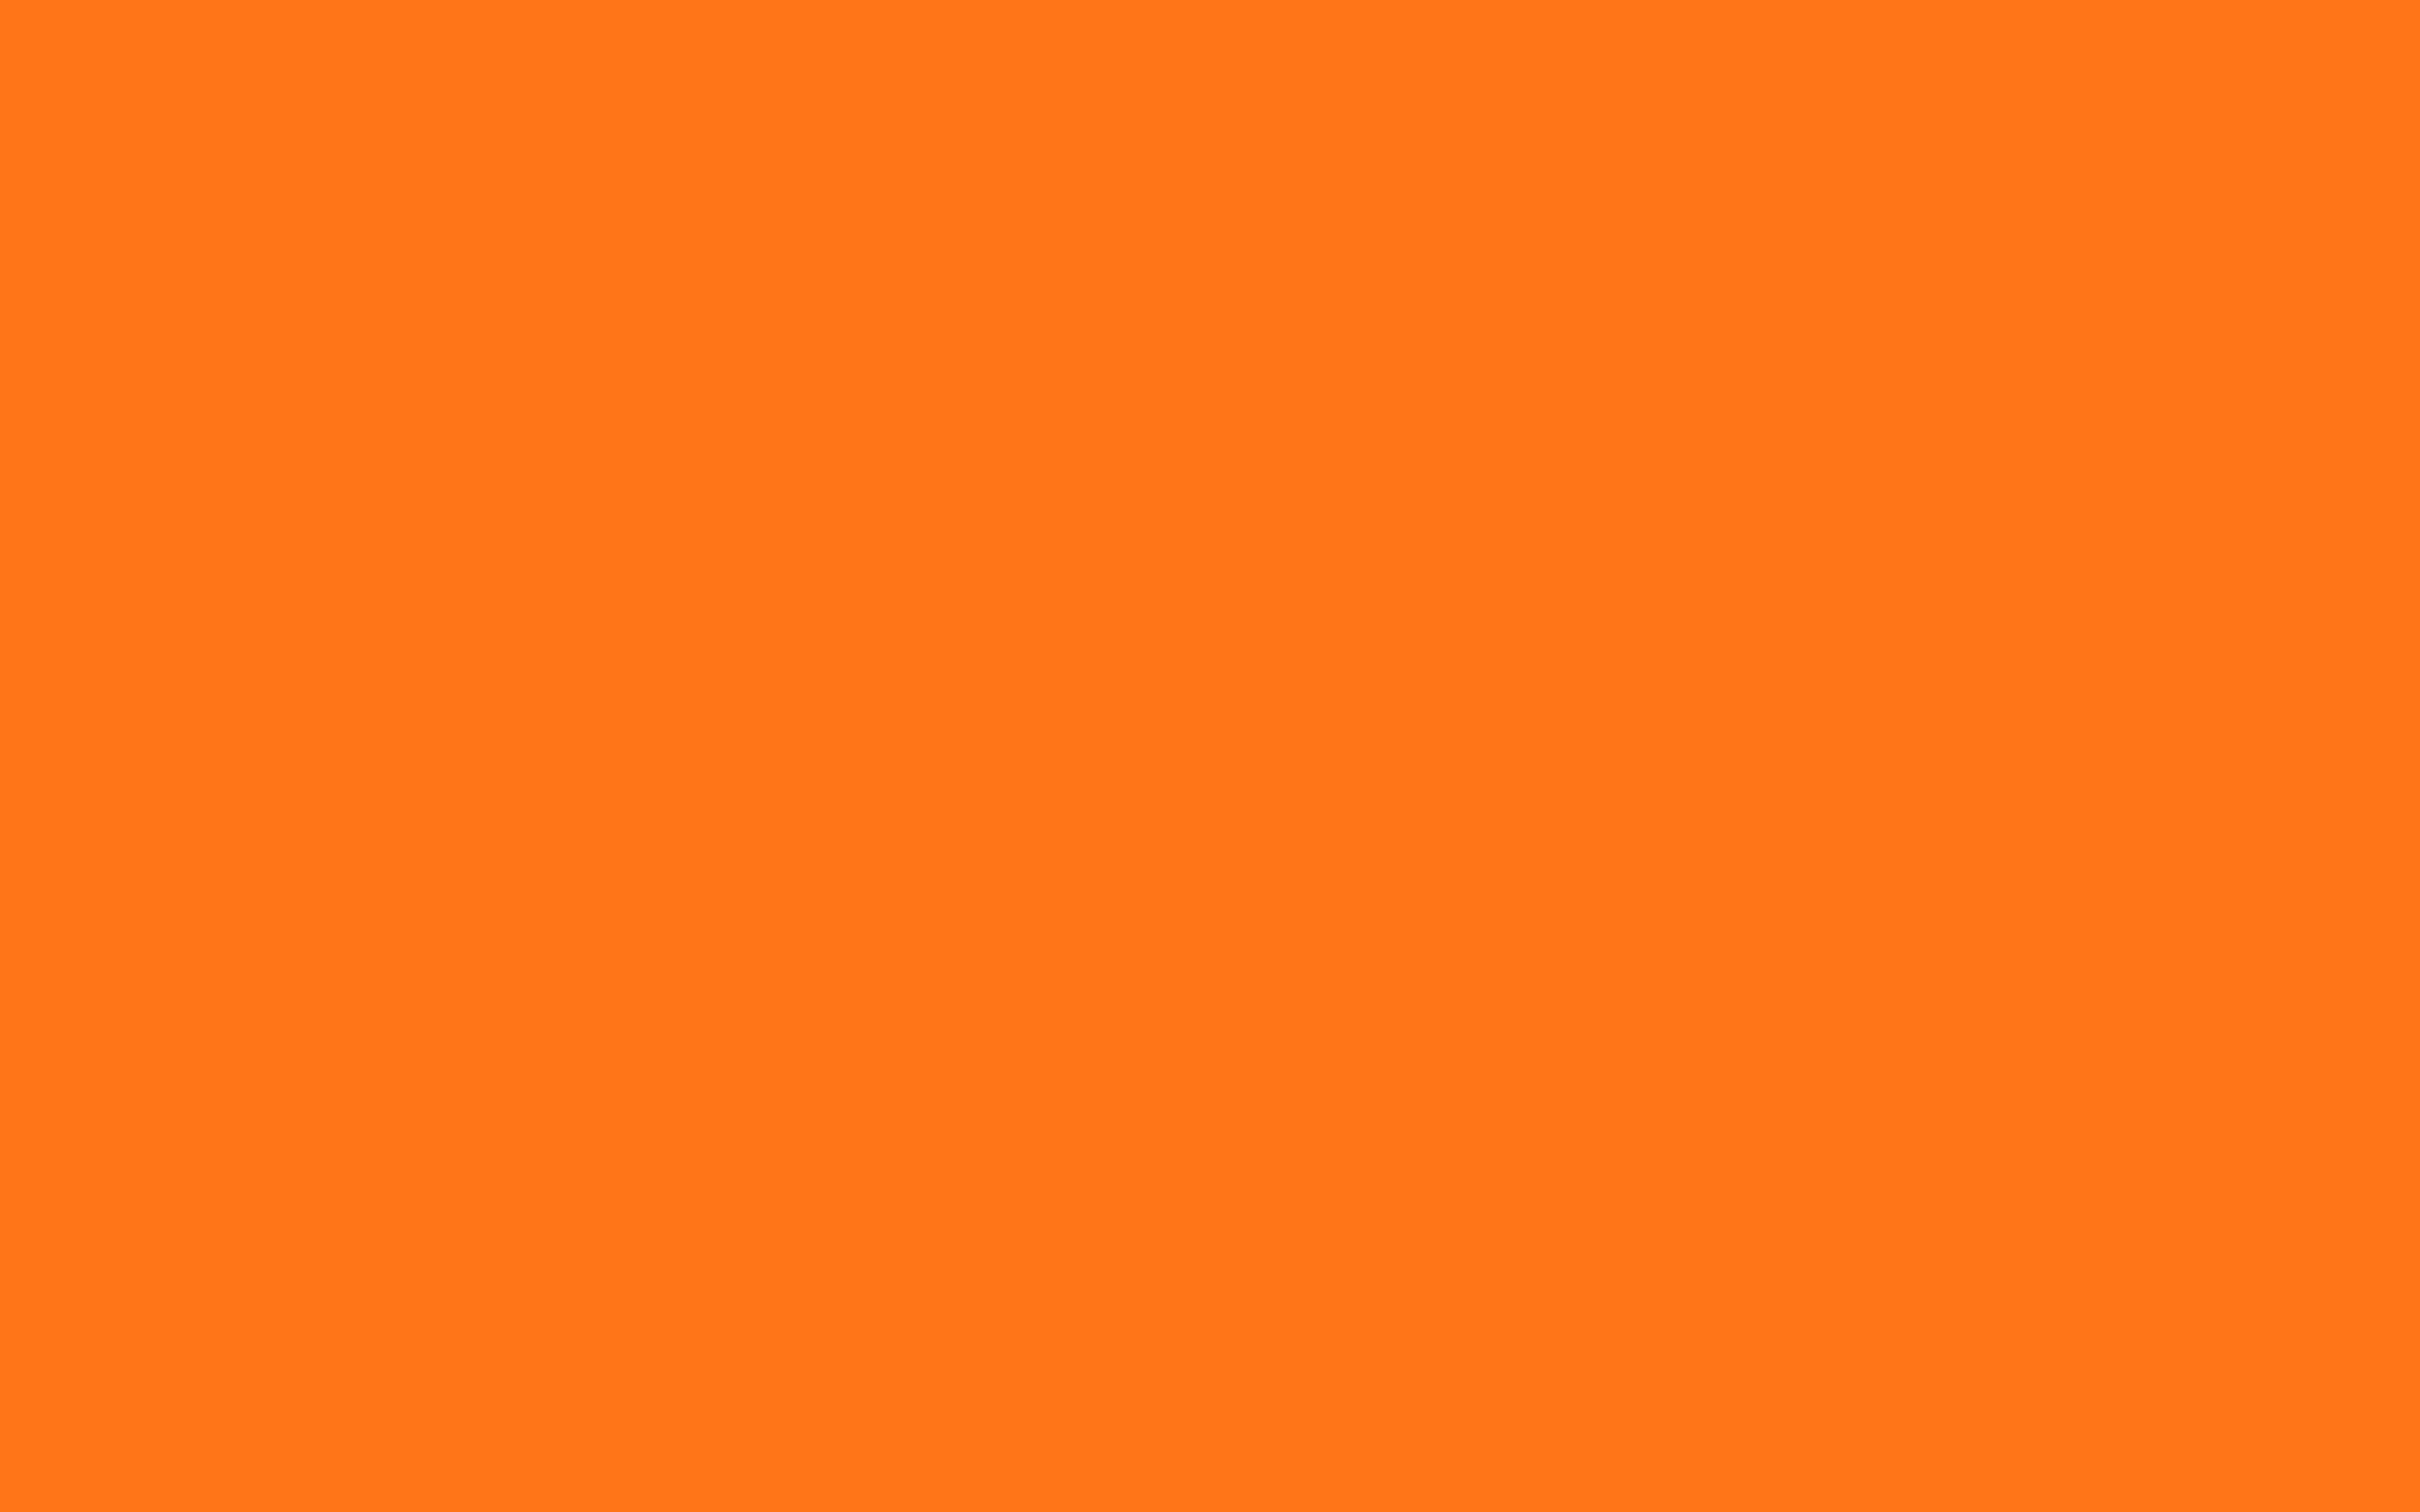 2560x1600 Pumpkin Solid Color Background